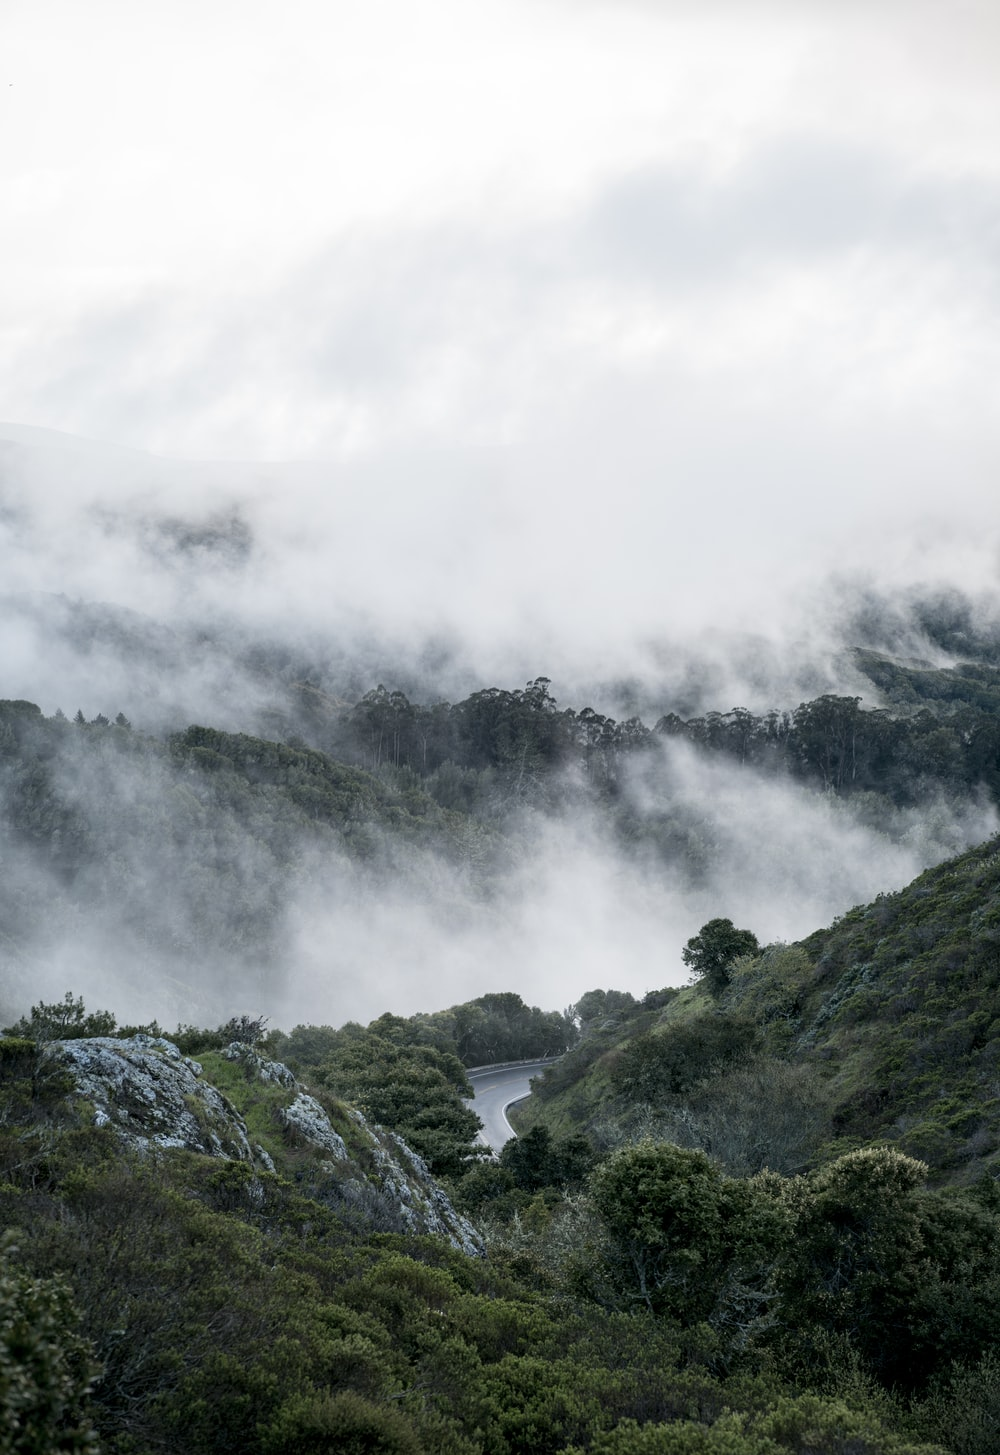 body of water between mountain under foggy sky